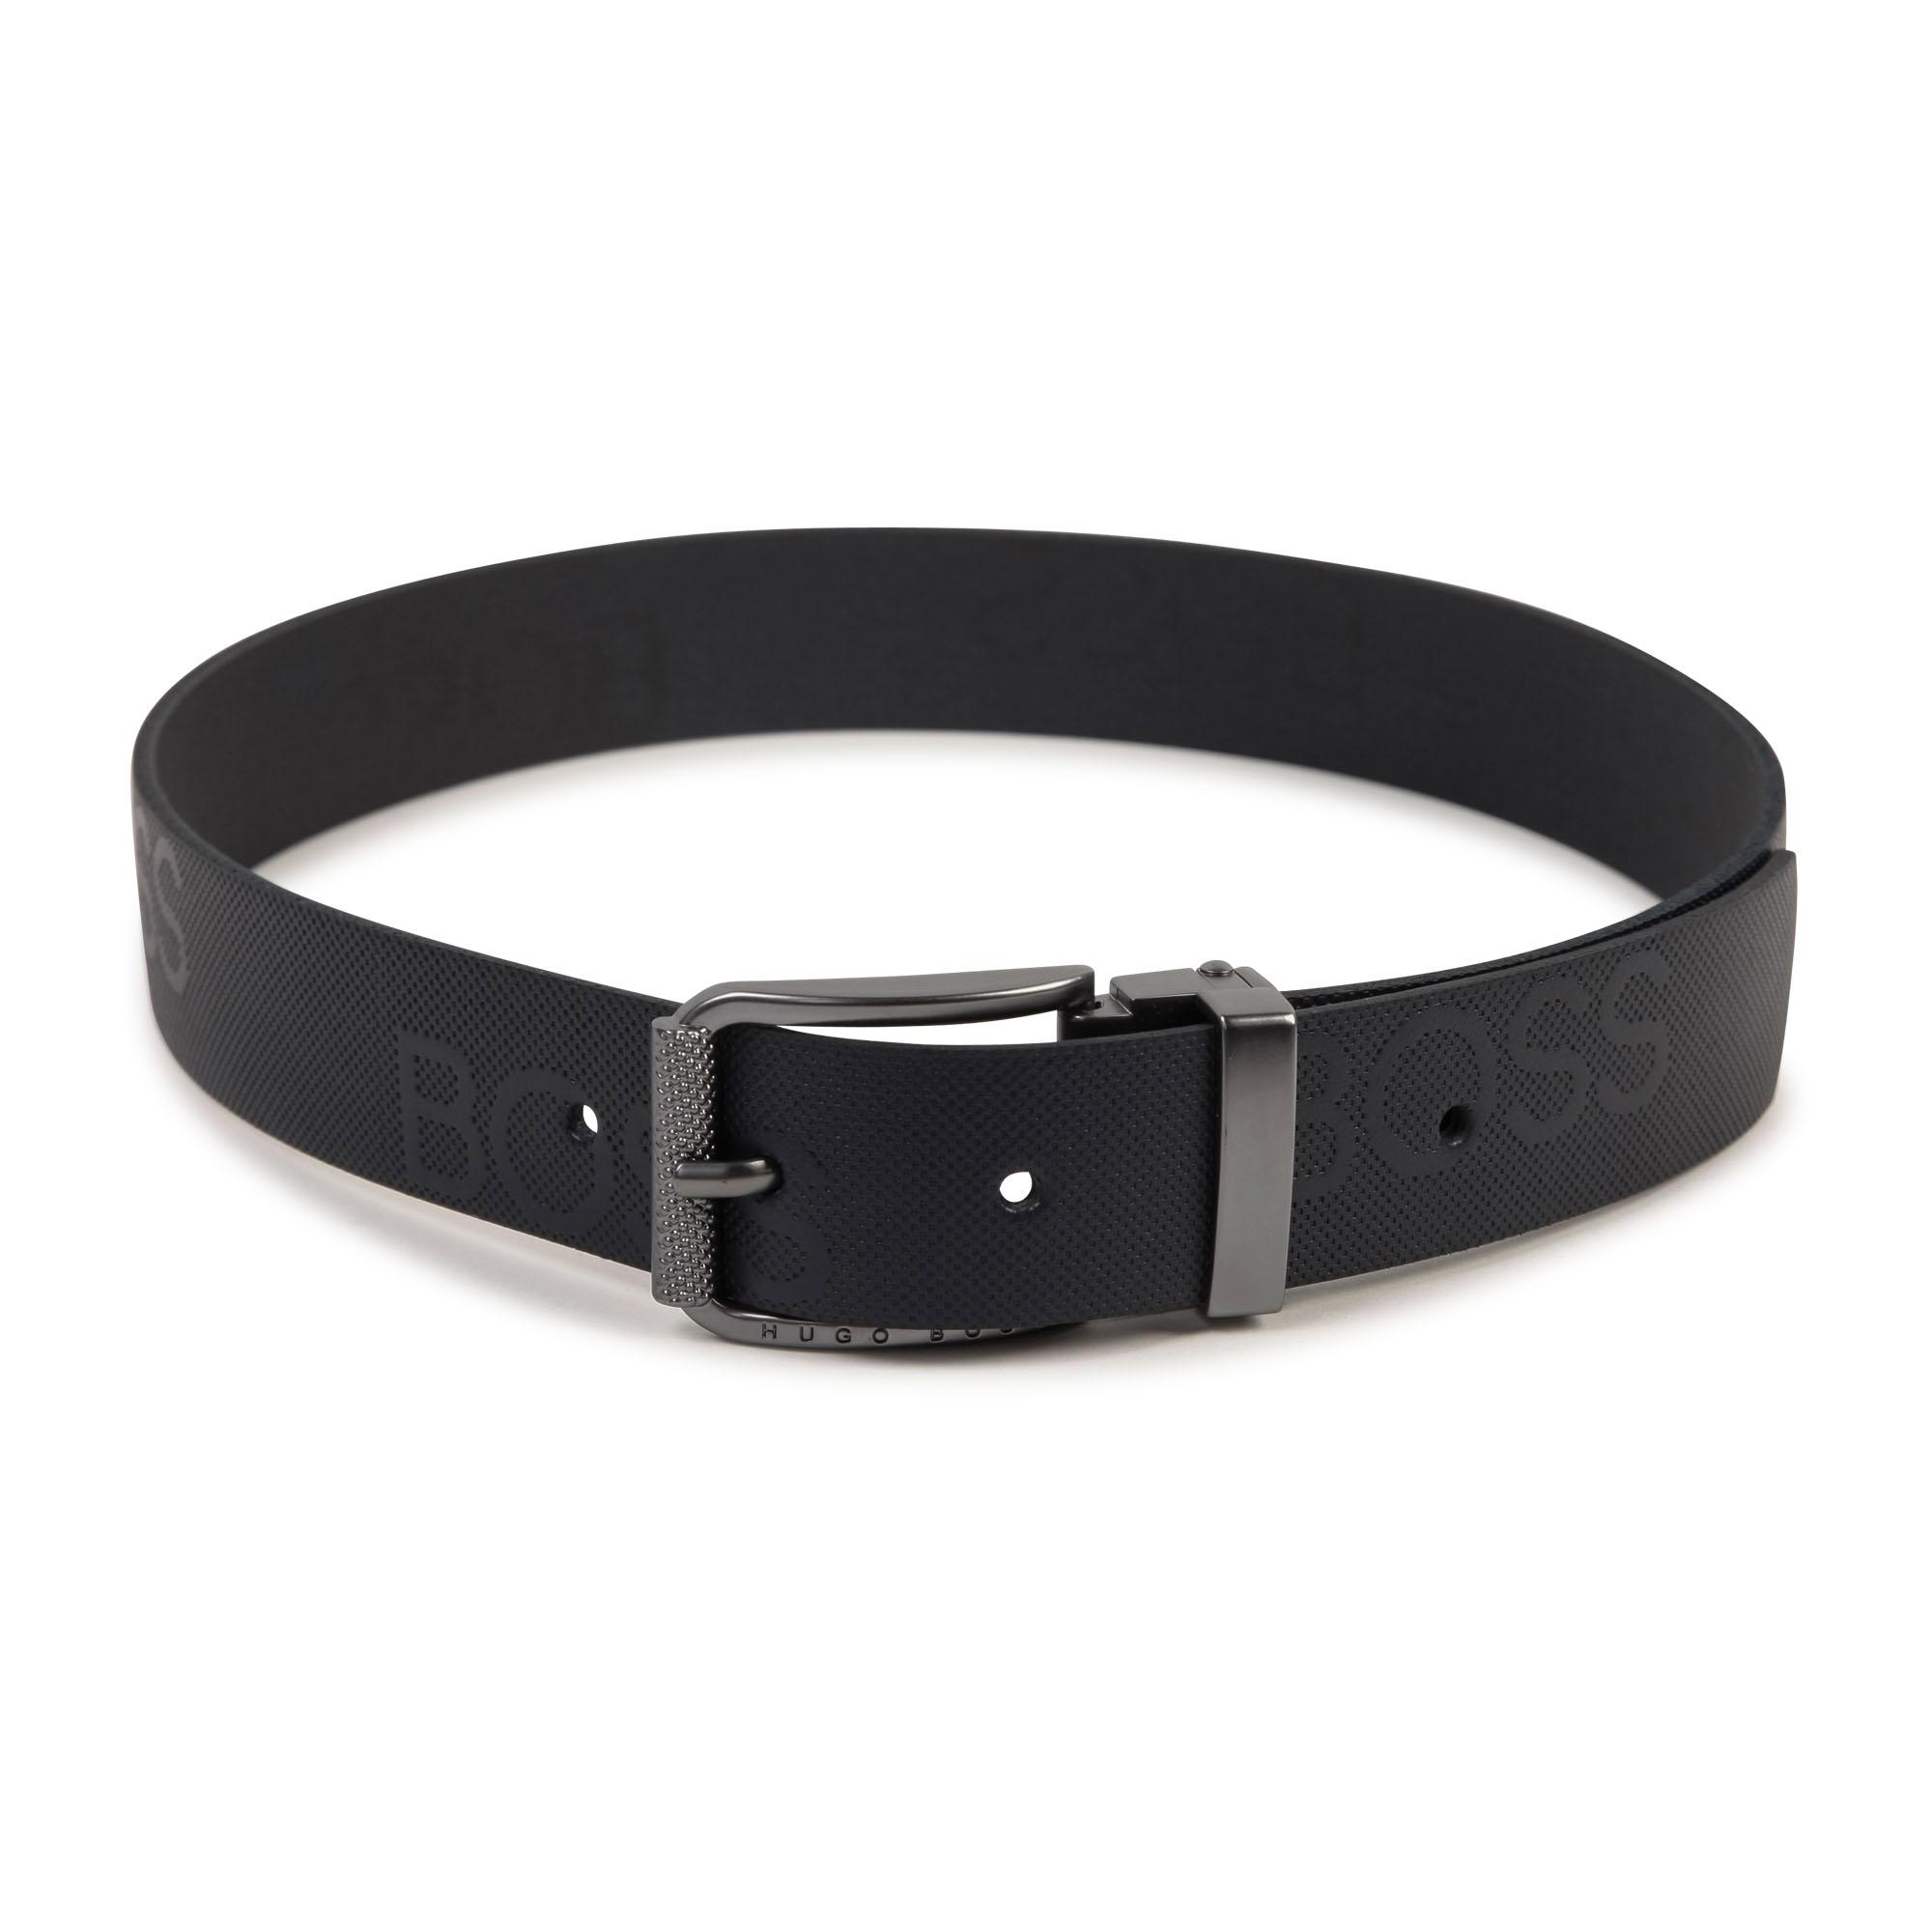 Leather belt BOSS for BOY